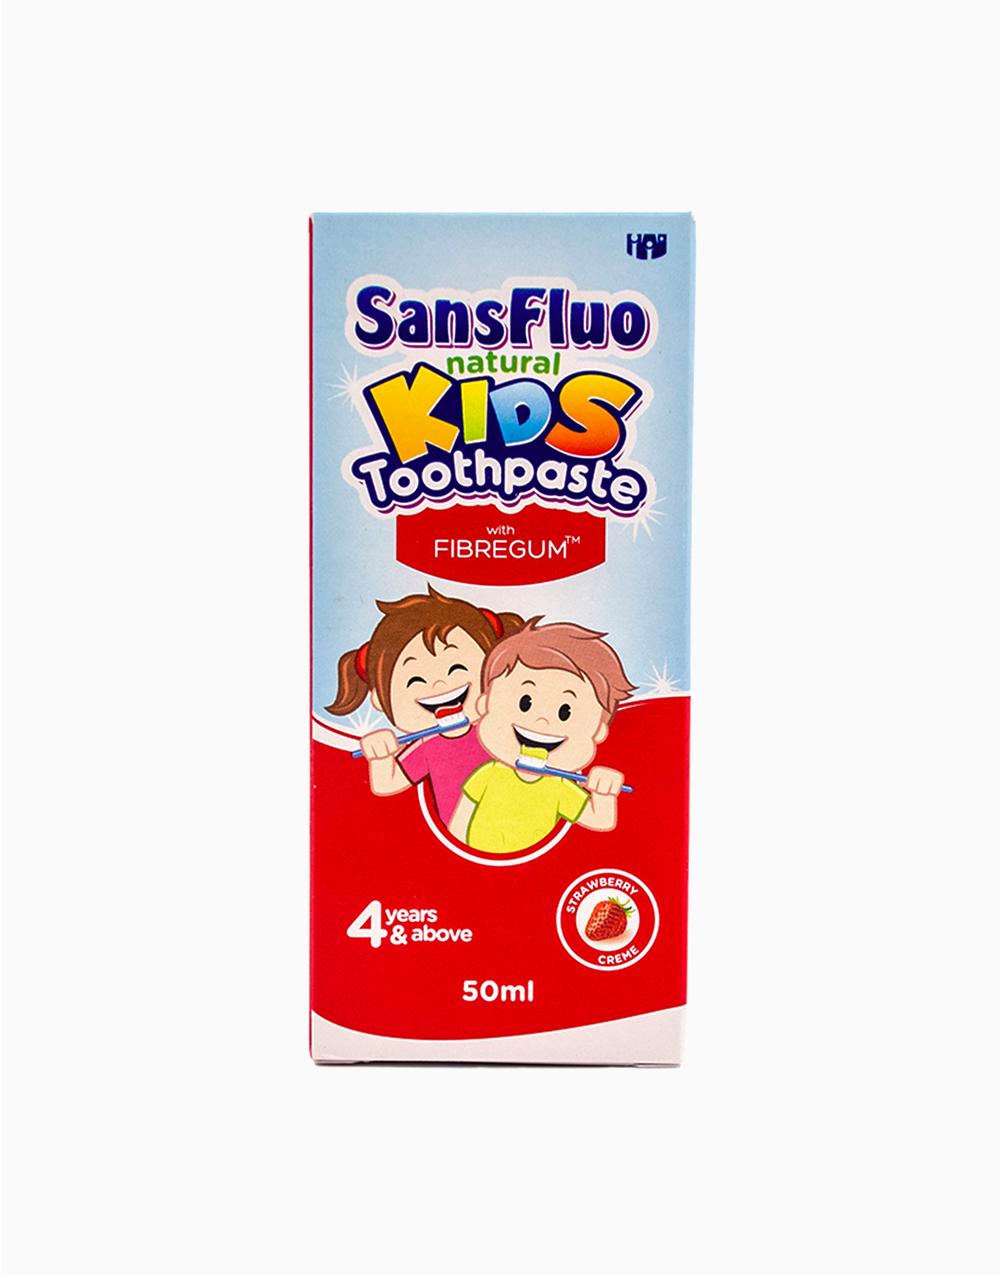 SansFluo Natural Kids Toothpaste (50ml) by Sansfluo | Strawberry Crème